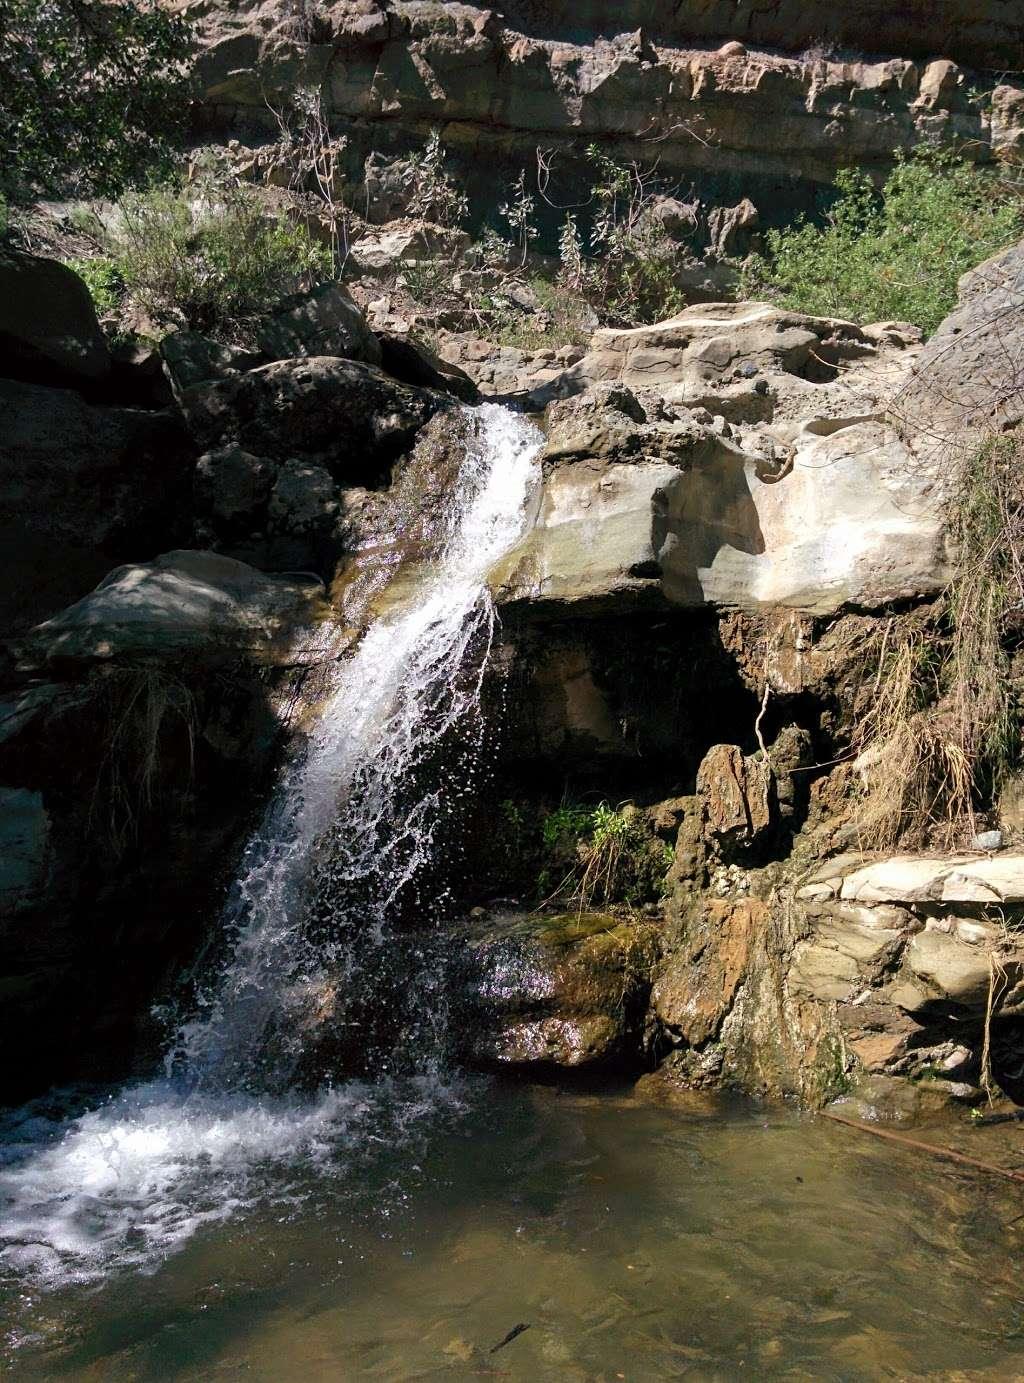 Black Star Canyon Falls - park    Photo 4 of 10   Address: 10499, 10967 Black Star Canyon Rd, Silverado, CA 92676, USA